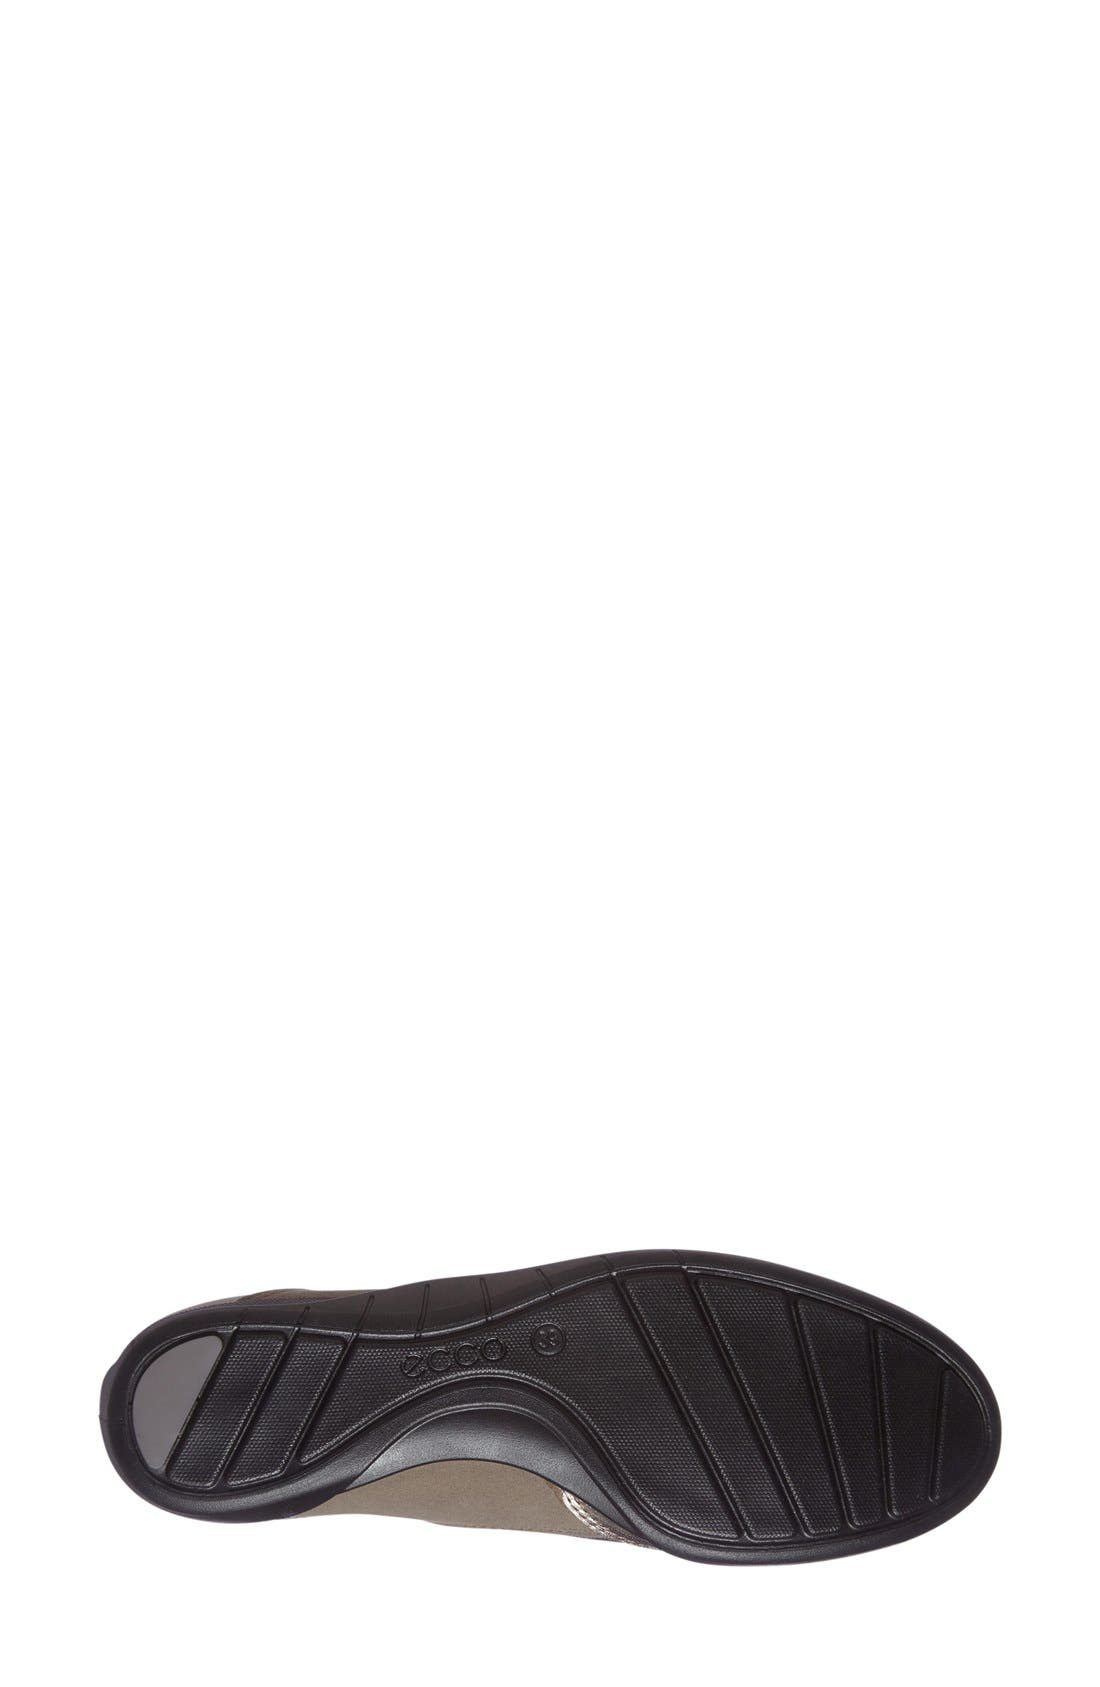 'Bluma' Sneaker,                             Alternate thumbnail 4, color,                             097